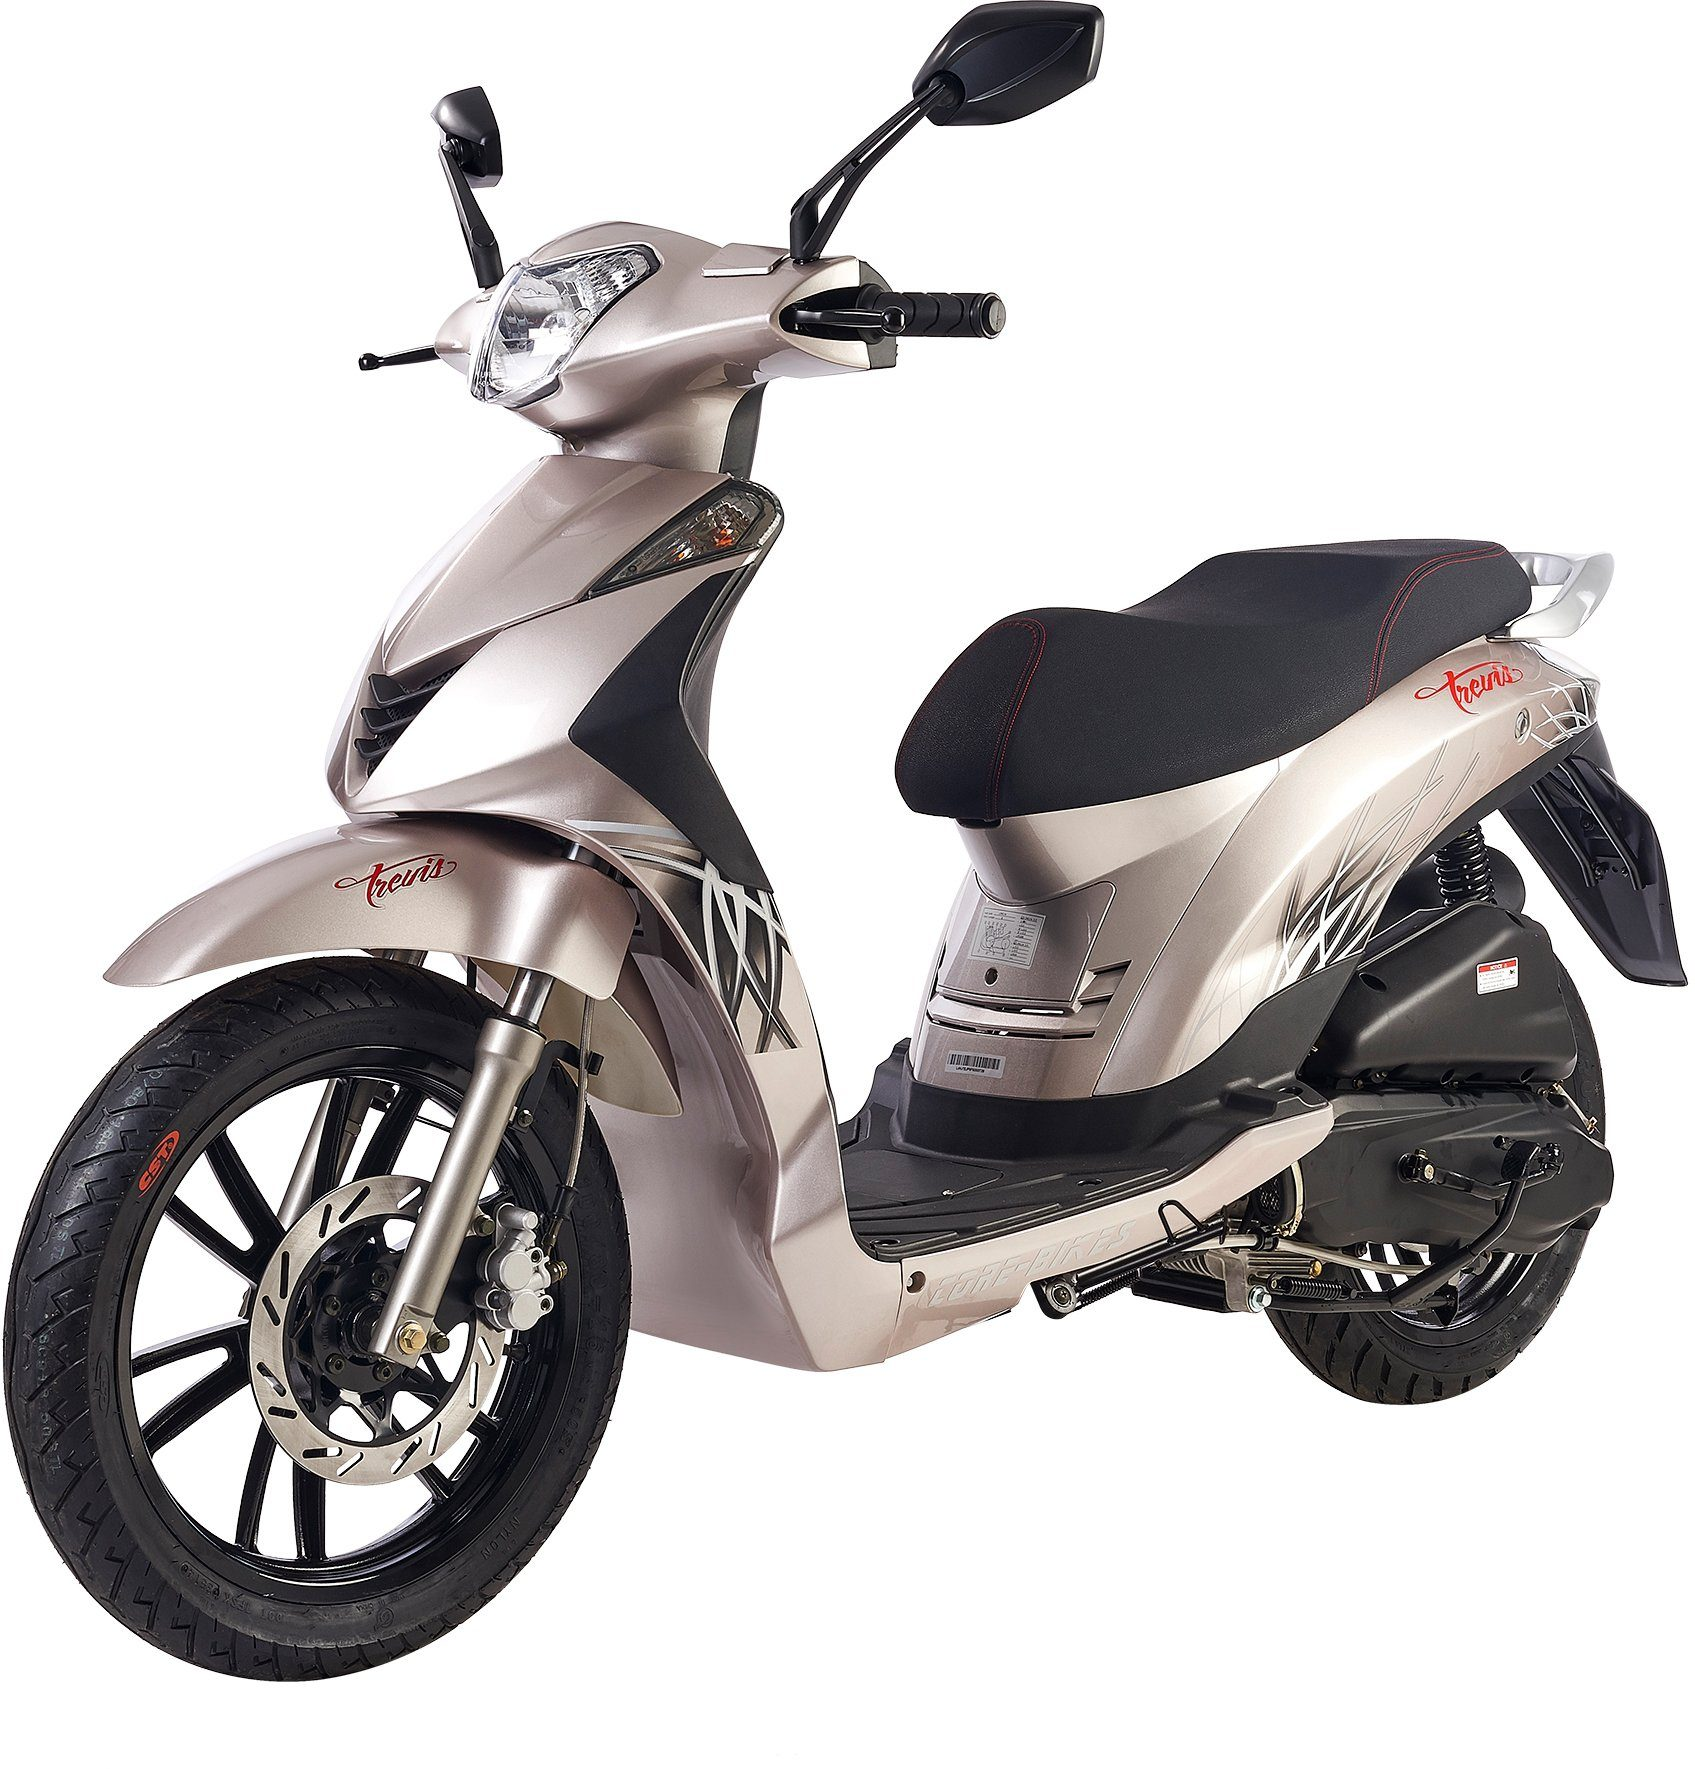 Luxxon Motorroller »Core-Bikes Trevis«, 50 ccm, 45 km/h, Euro 2, 50 ccm, 45 km/h